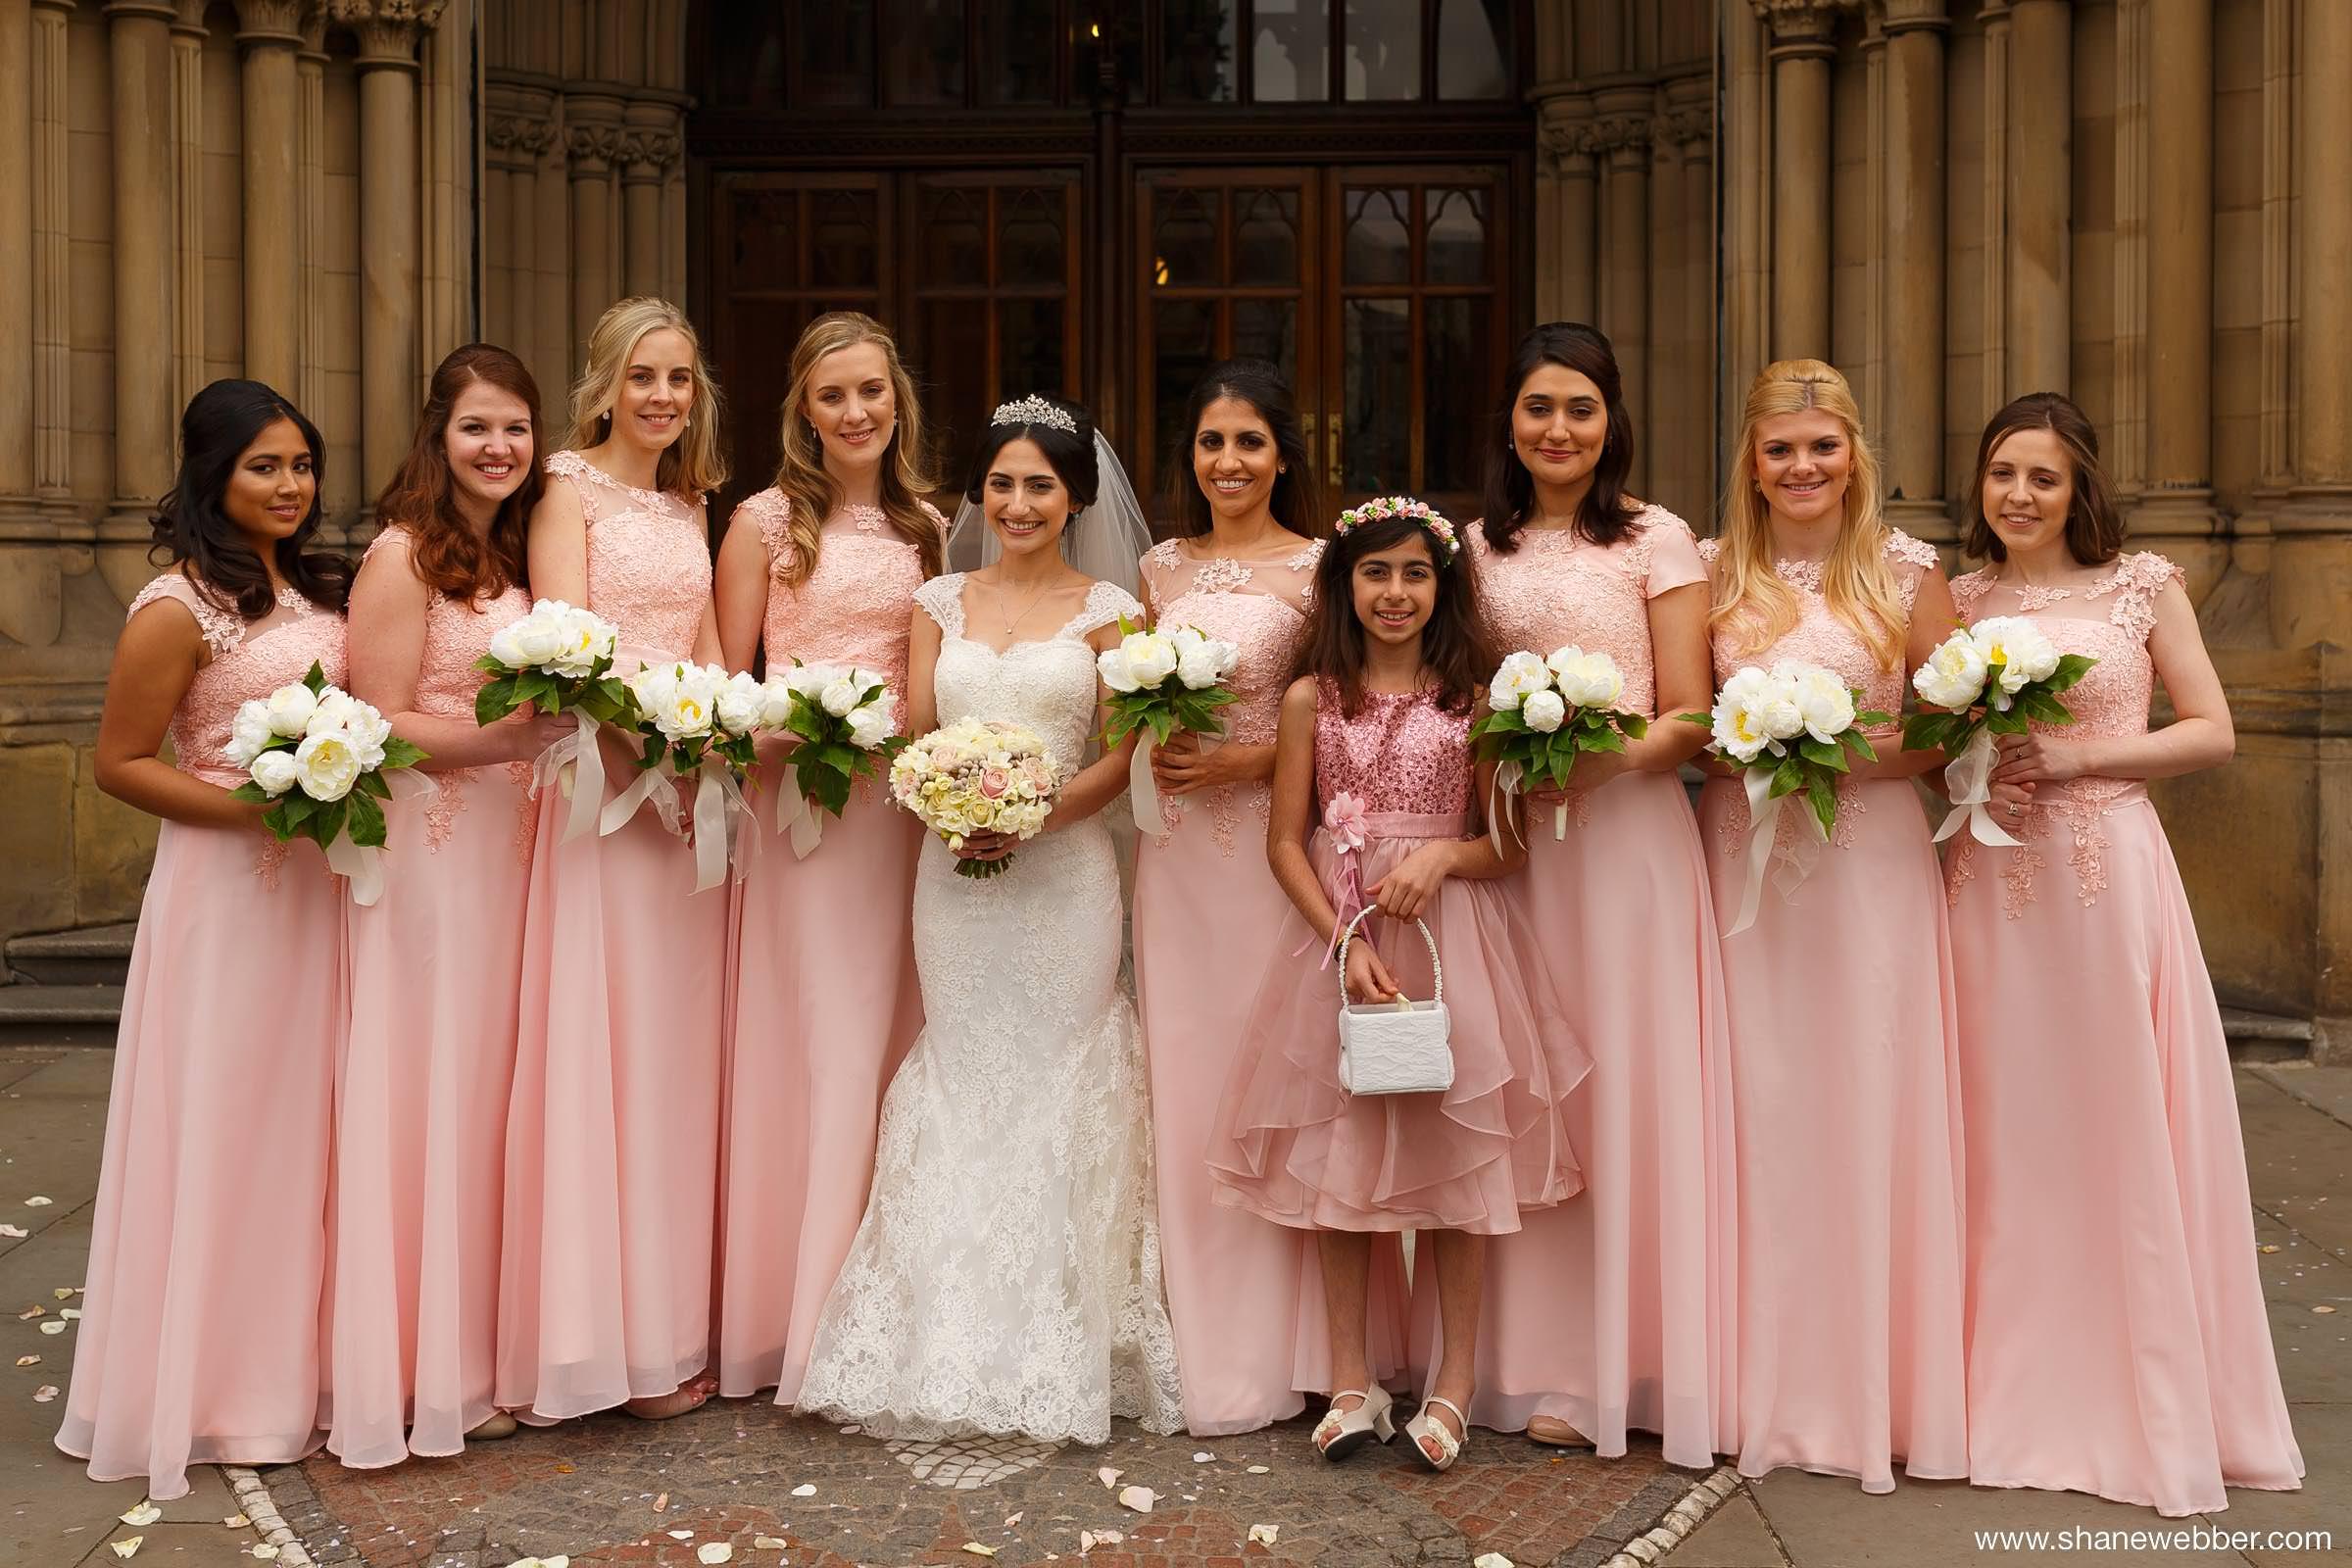 Iranian bridesmaids dresses